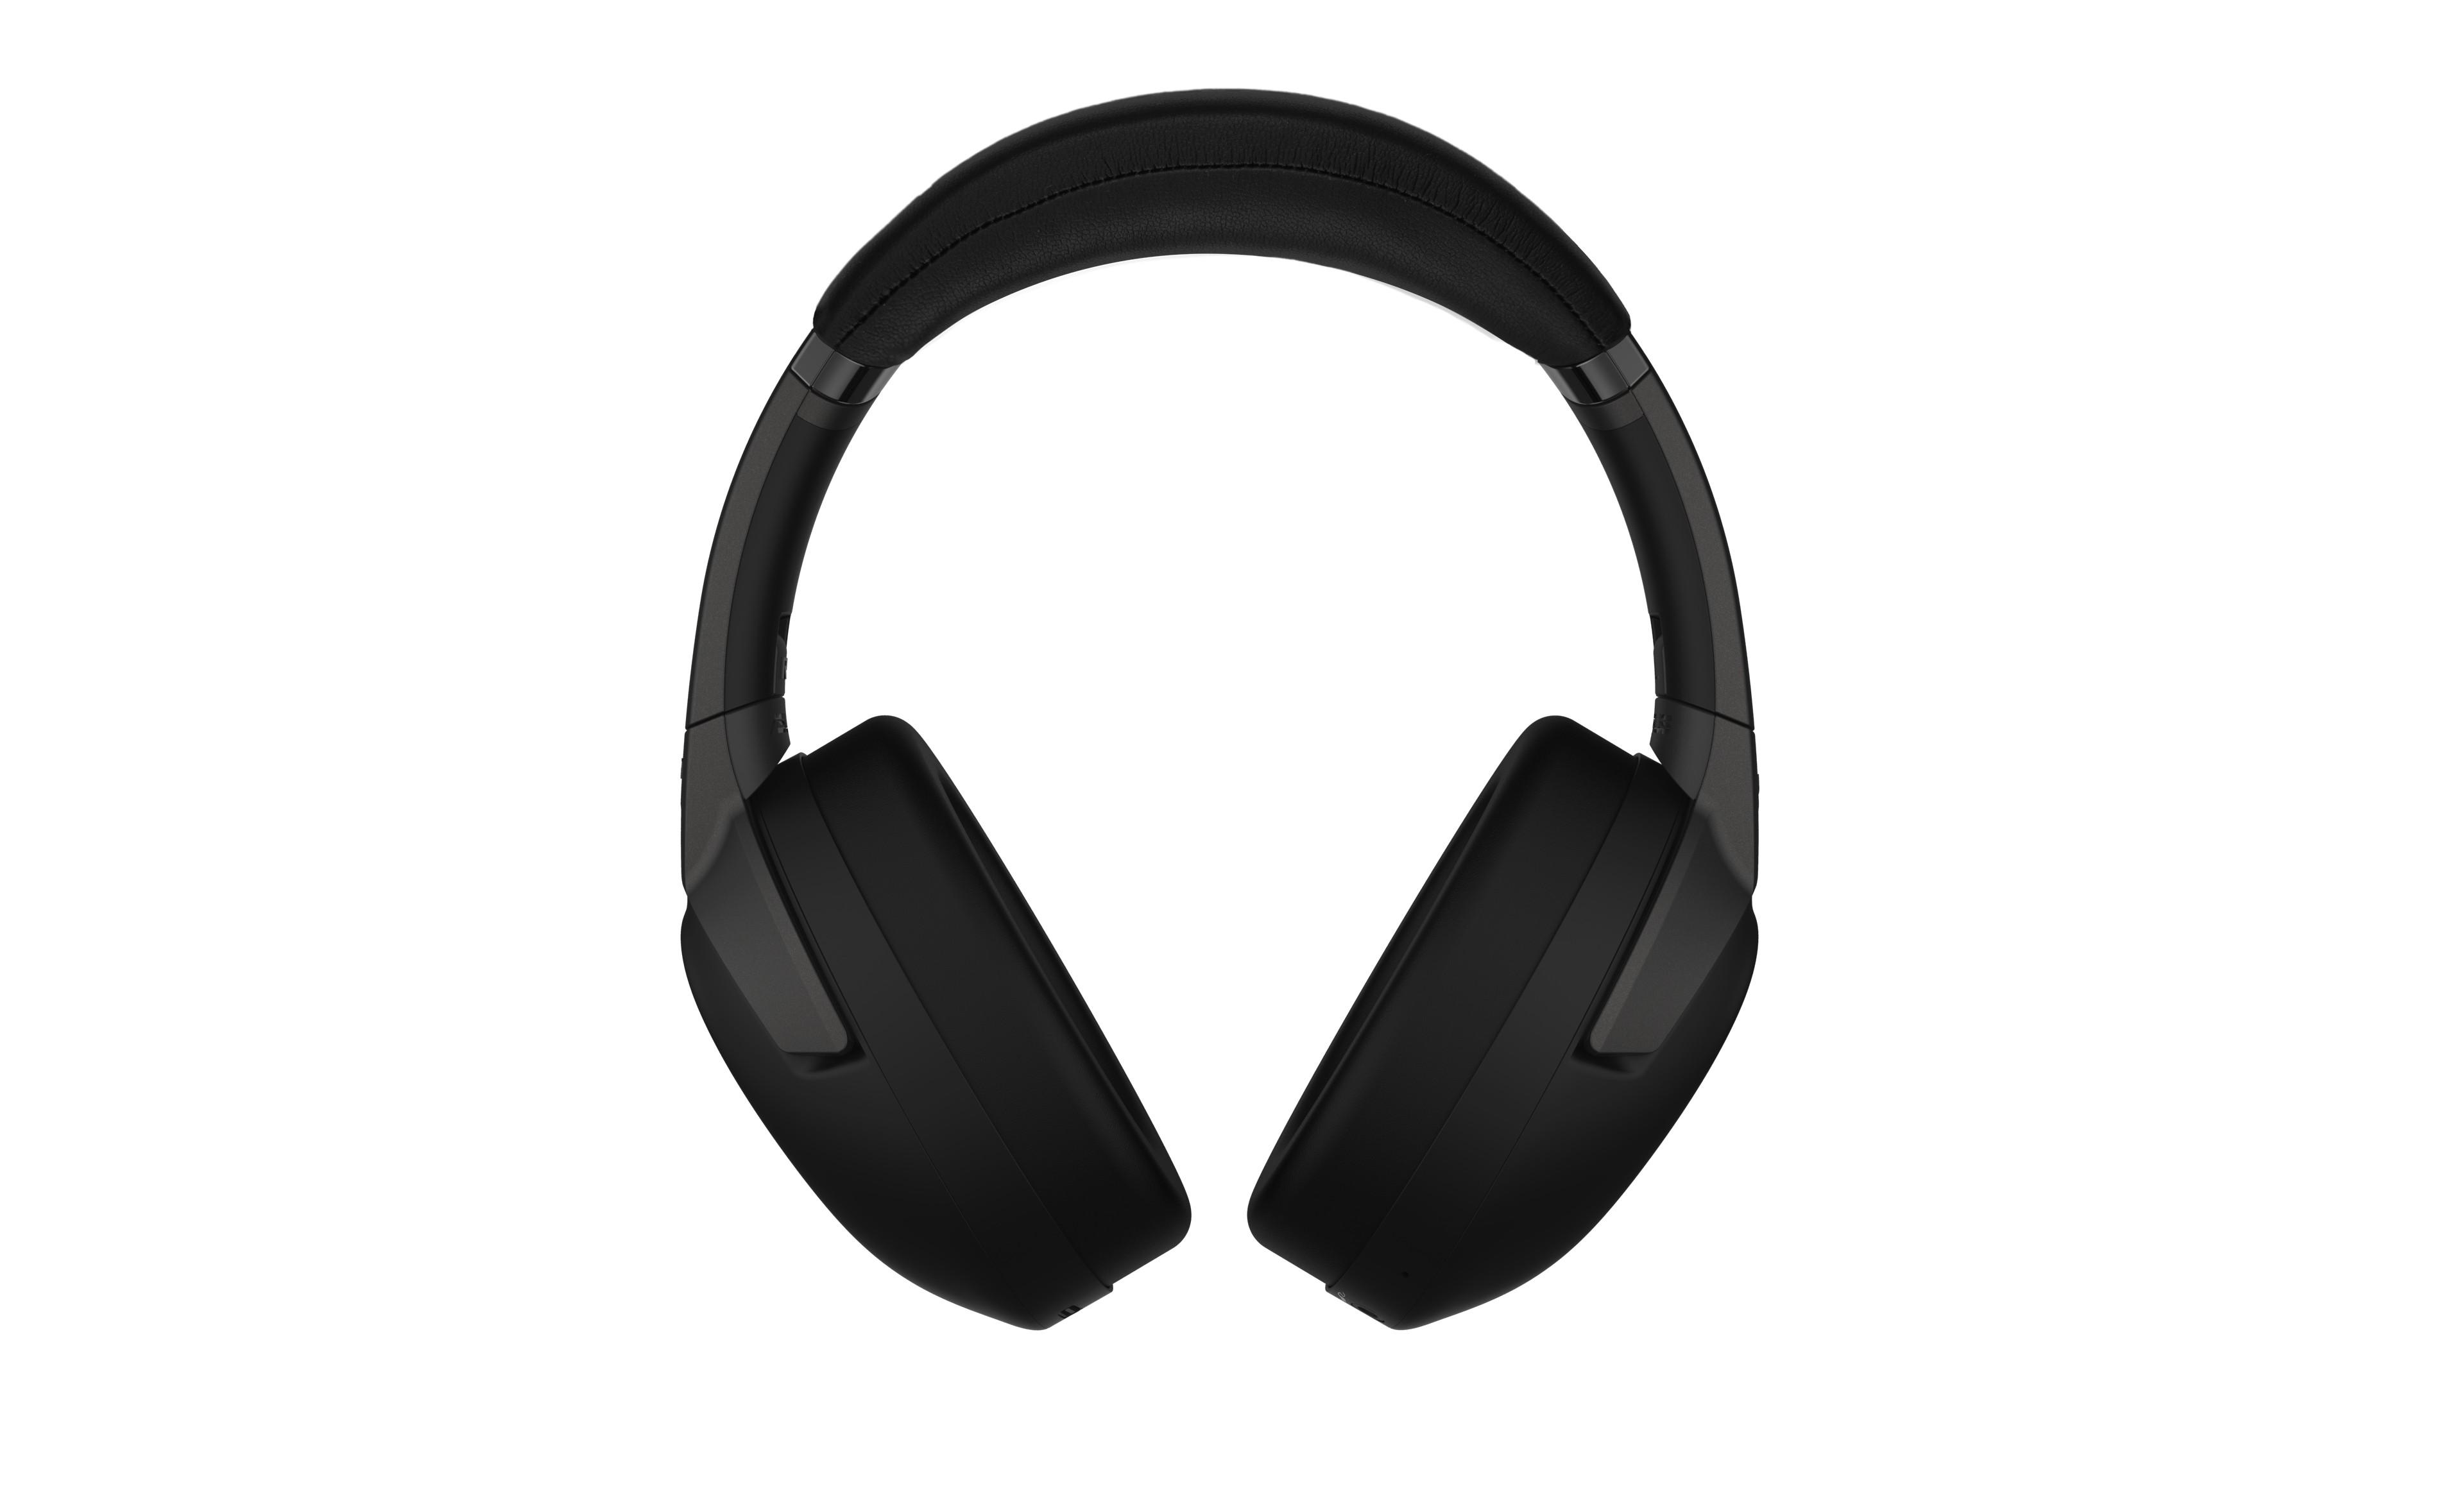 ASUS ROG Strix Go BT Headset Hoofdband 3,5mm-connector Bluetooth Zwart